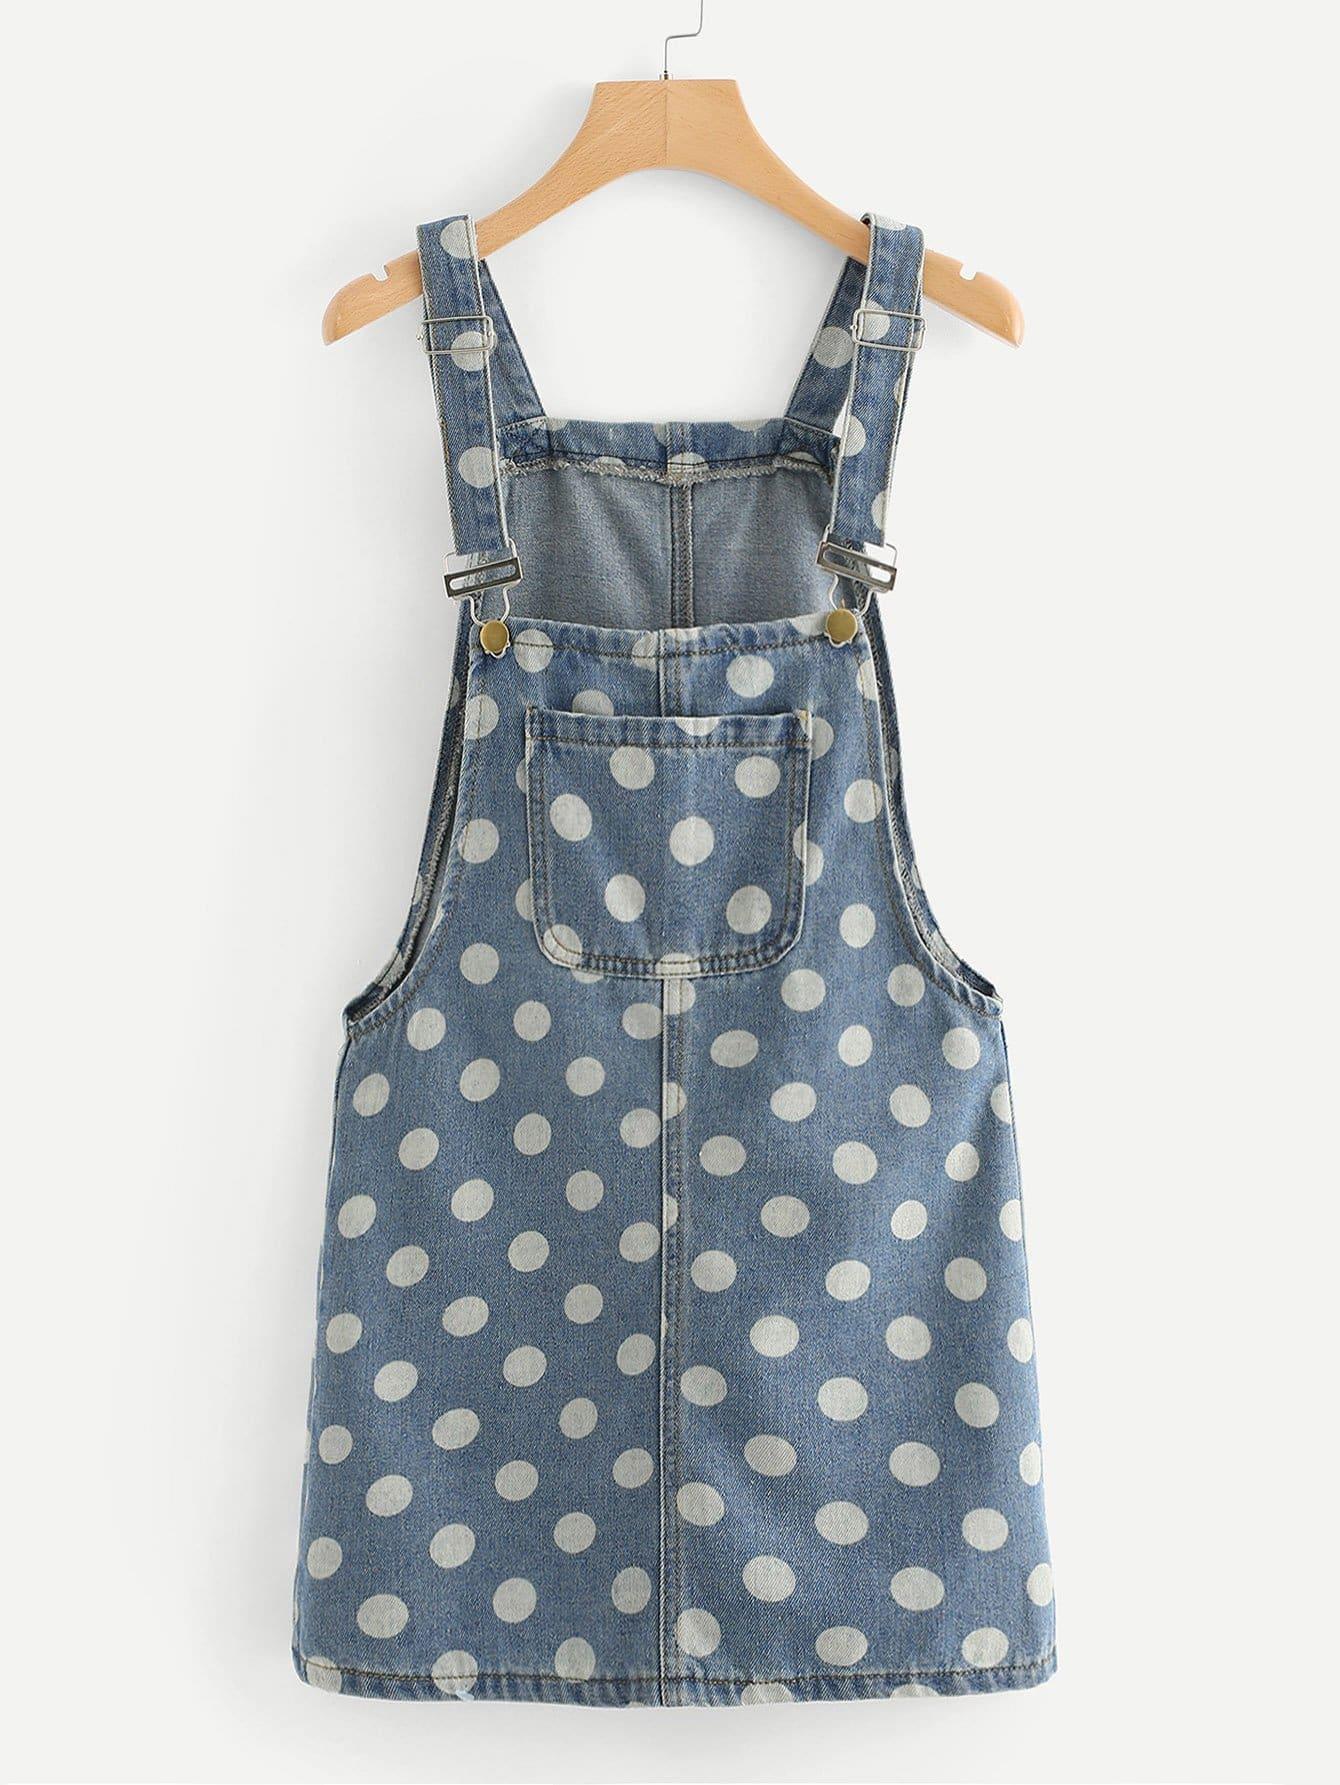 Dot Print Overall Denim Dress denim overall dress